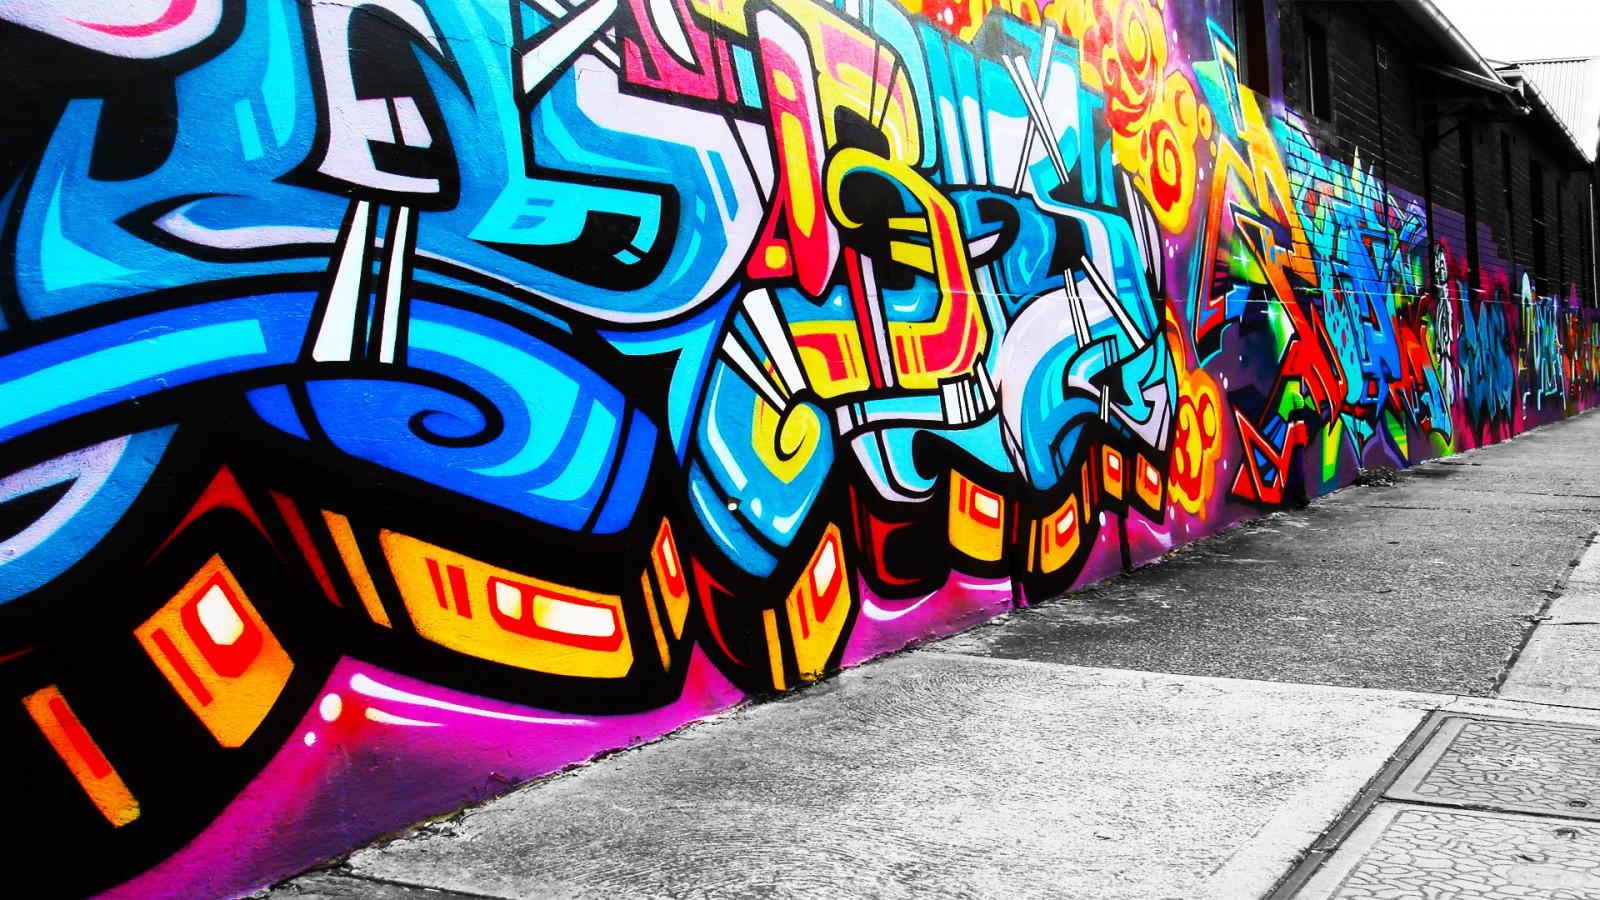 обои на телефон граффити на стенах настоящее